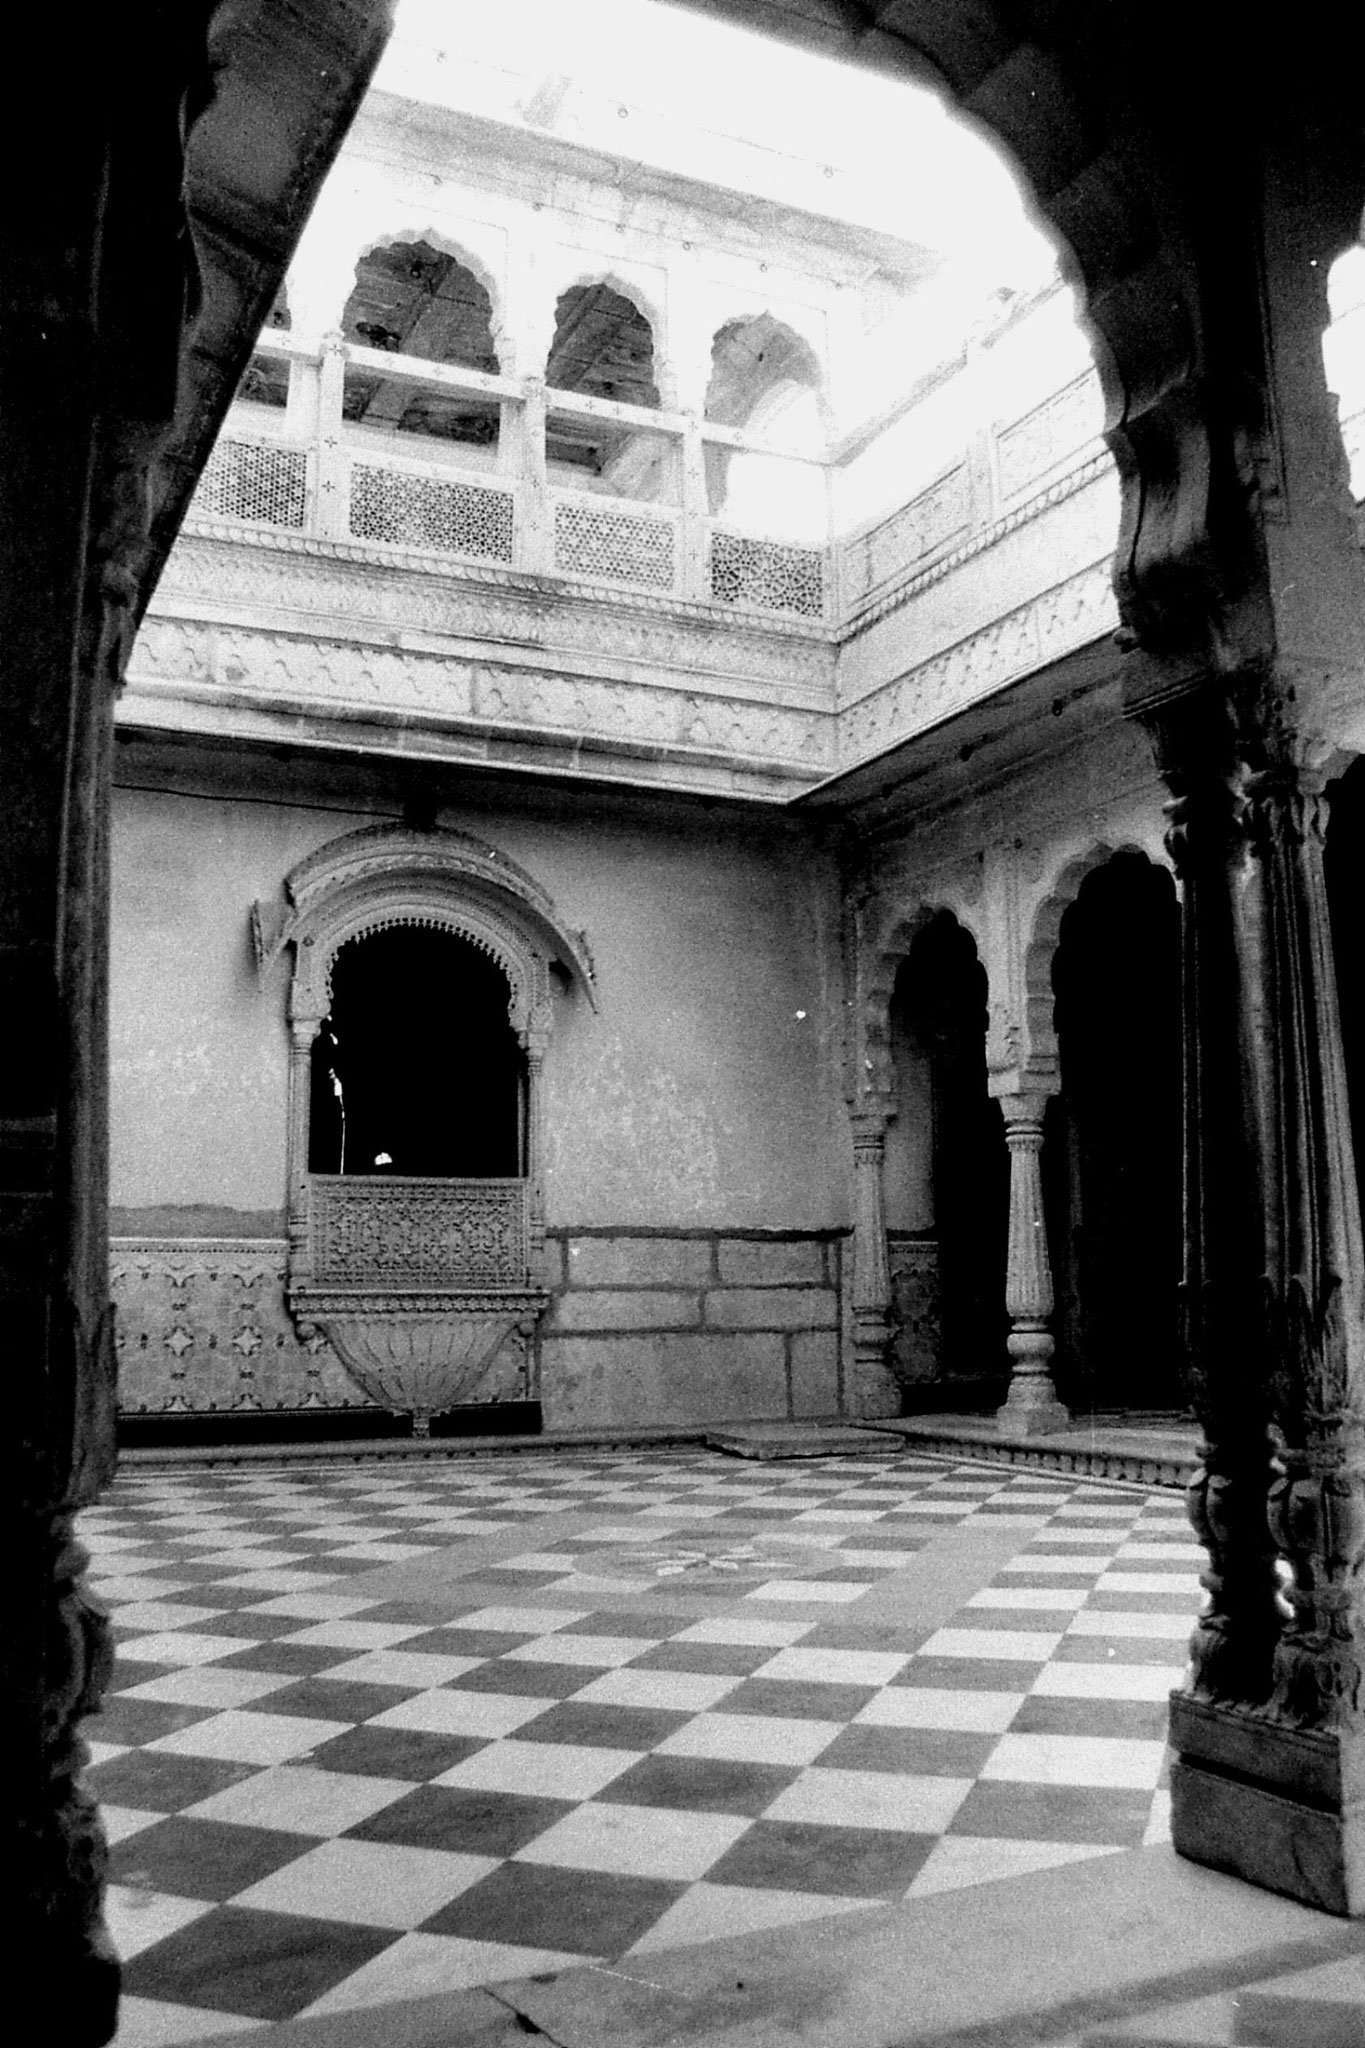 3/12/1989: 23: Jaisalmer courtyard